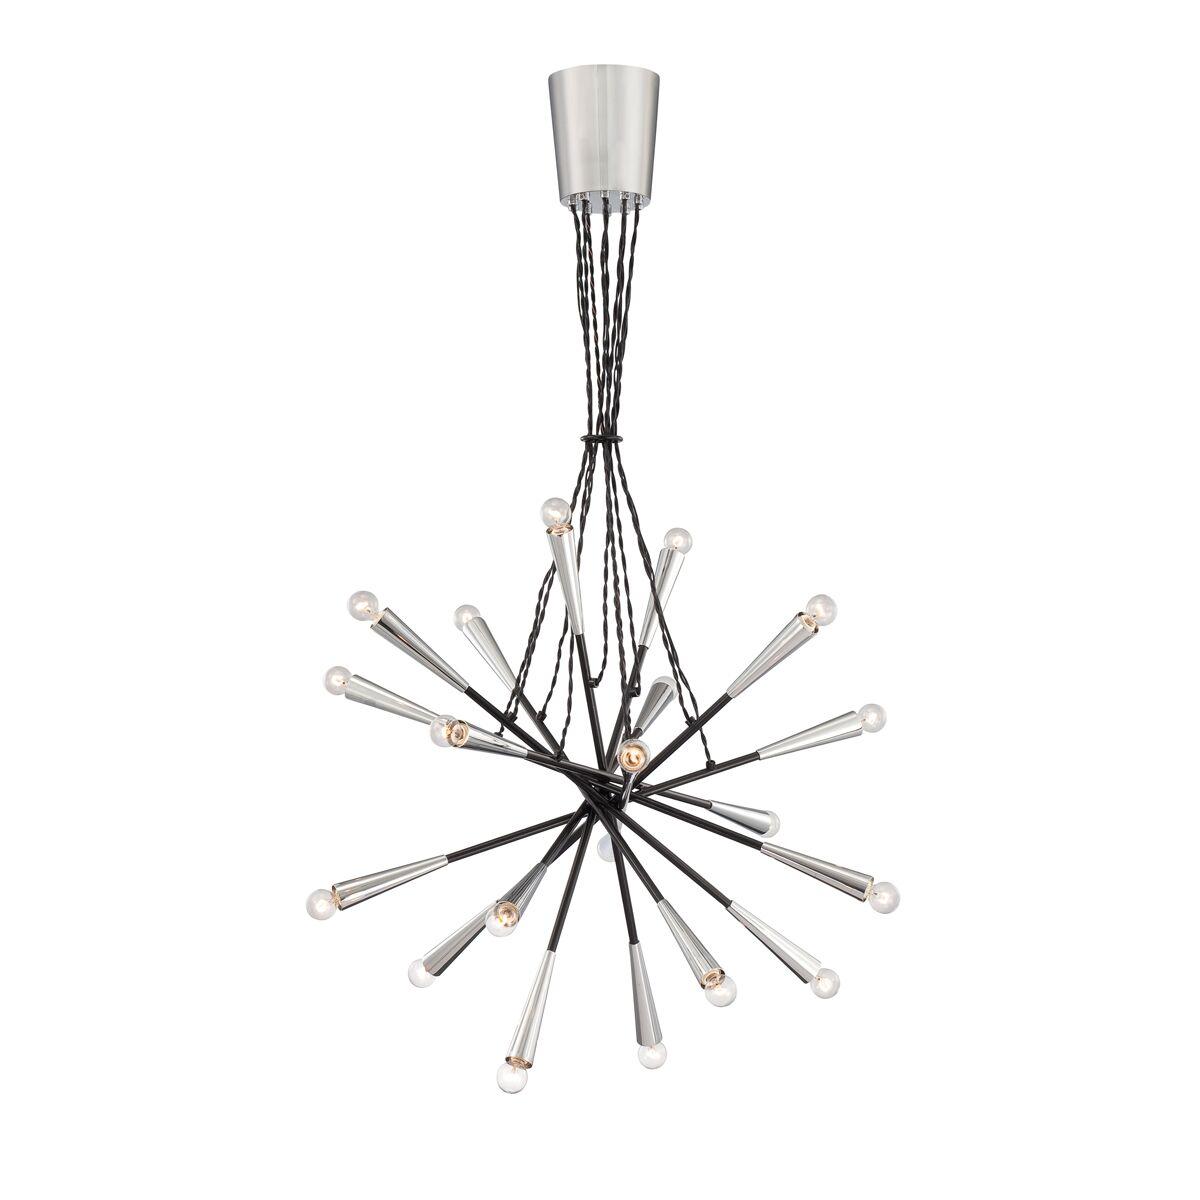 Zazu 20-Light Sputnik Chandelier Shade Color: Black / Black Wire